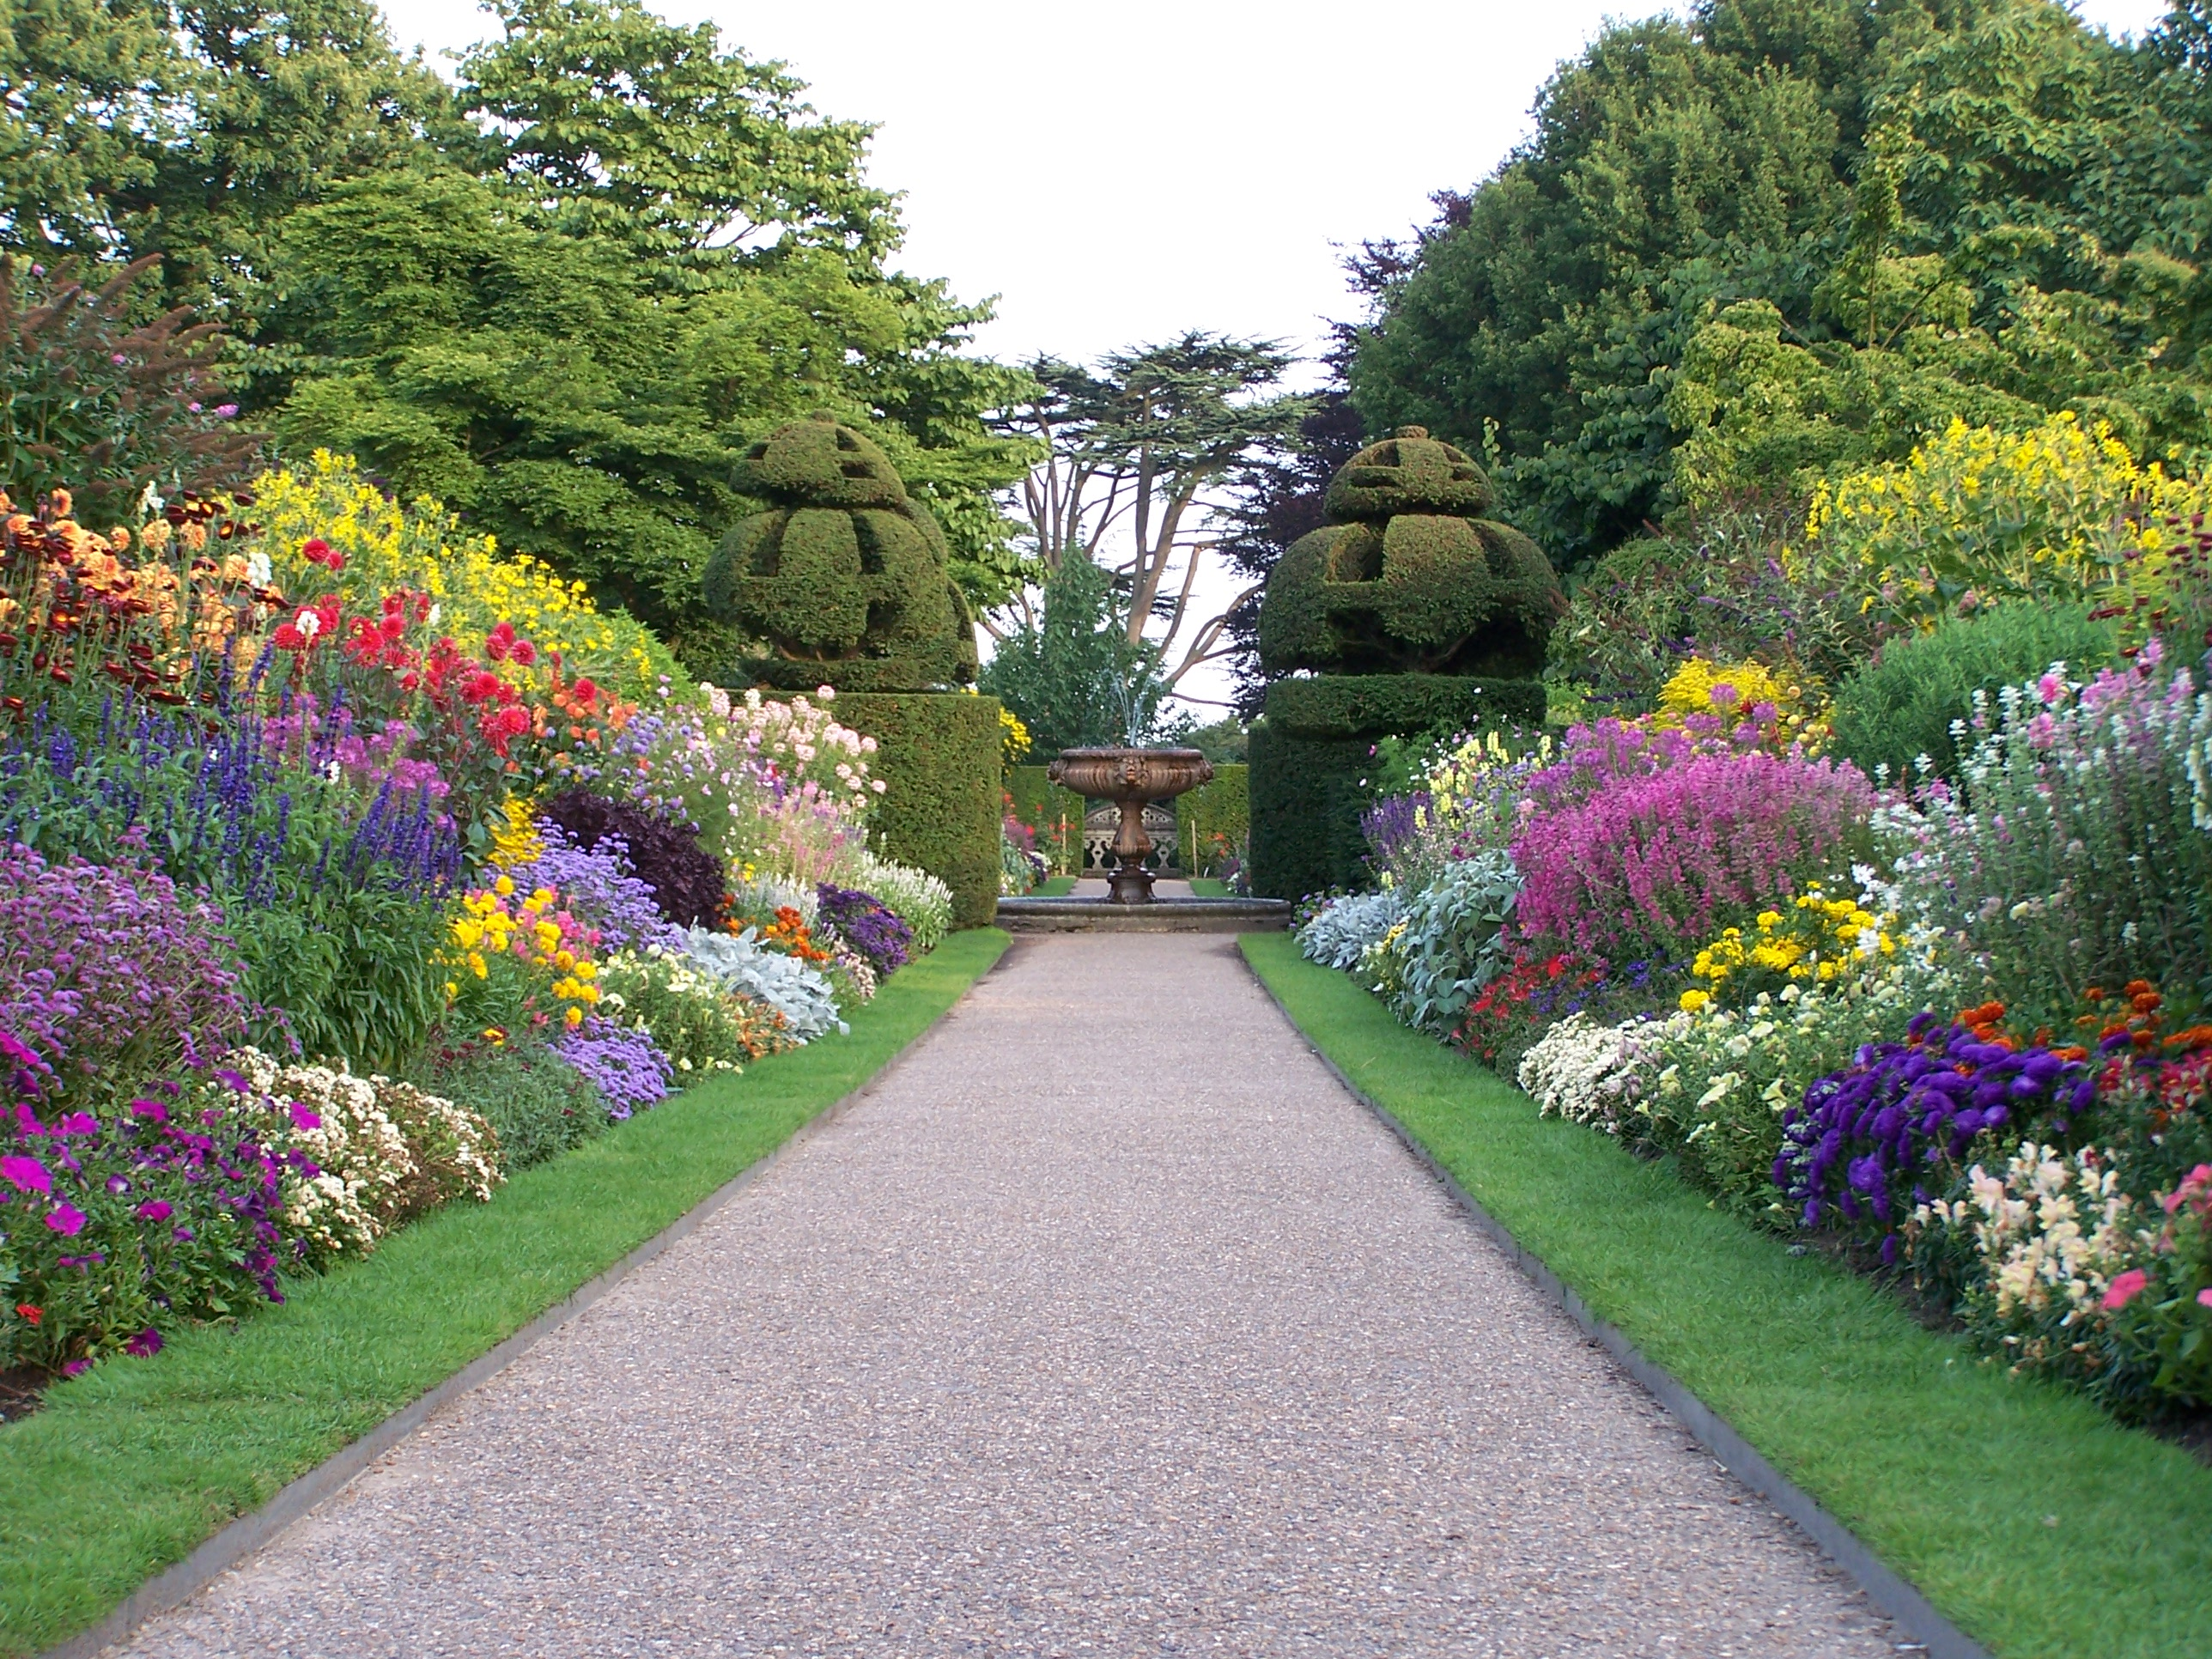 Nymans viaje a visitar jardines ingleses - Arboles bonitos para jardin ...